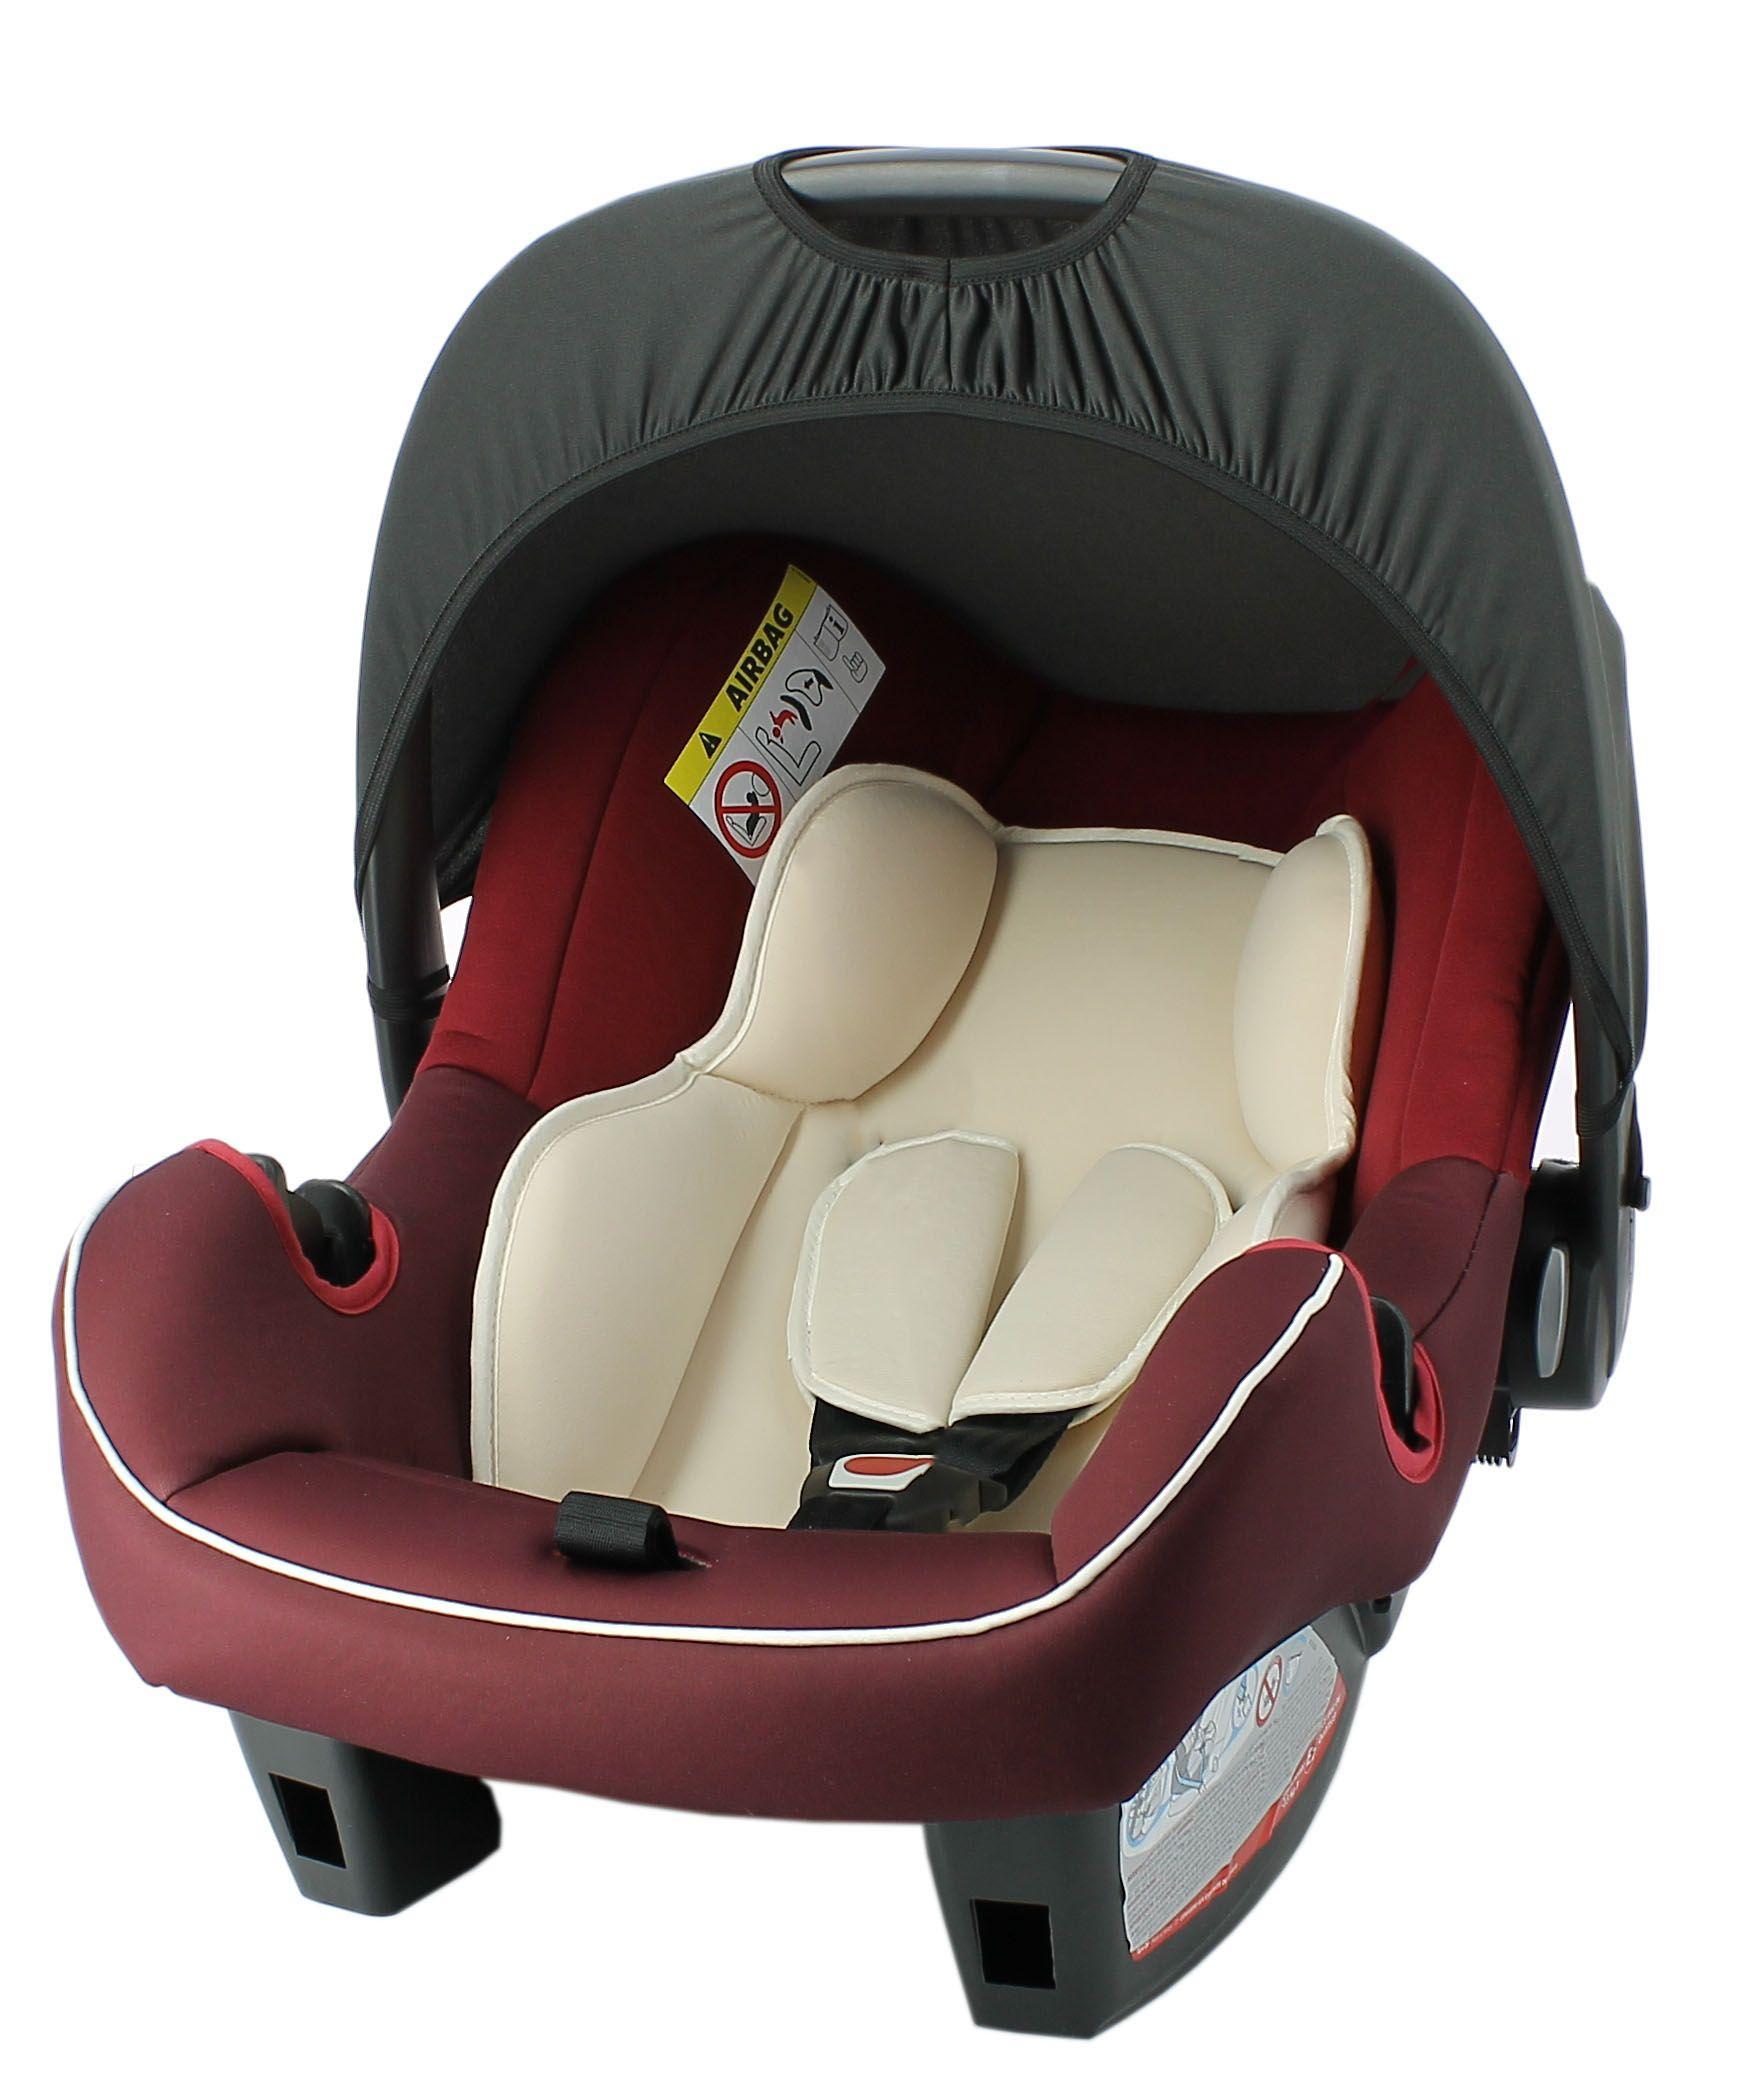 Siège auto bébé BEONE groupe 0+ (0-13kg) – Ziba red